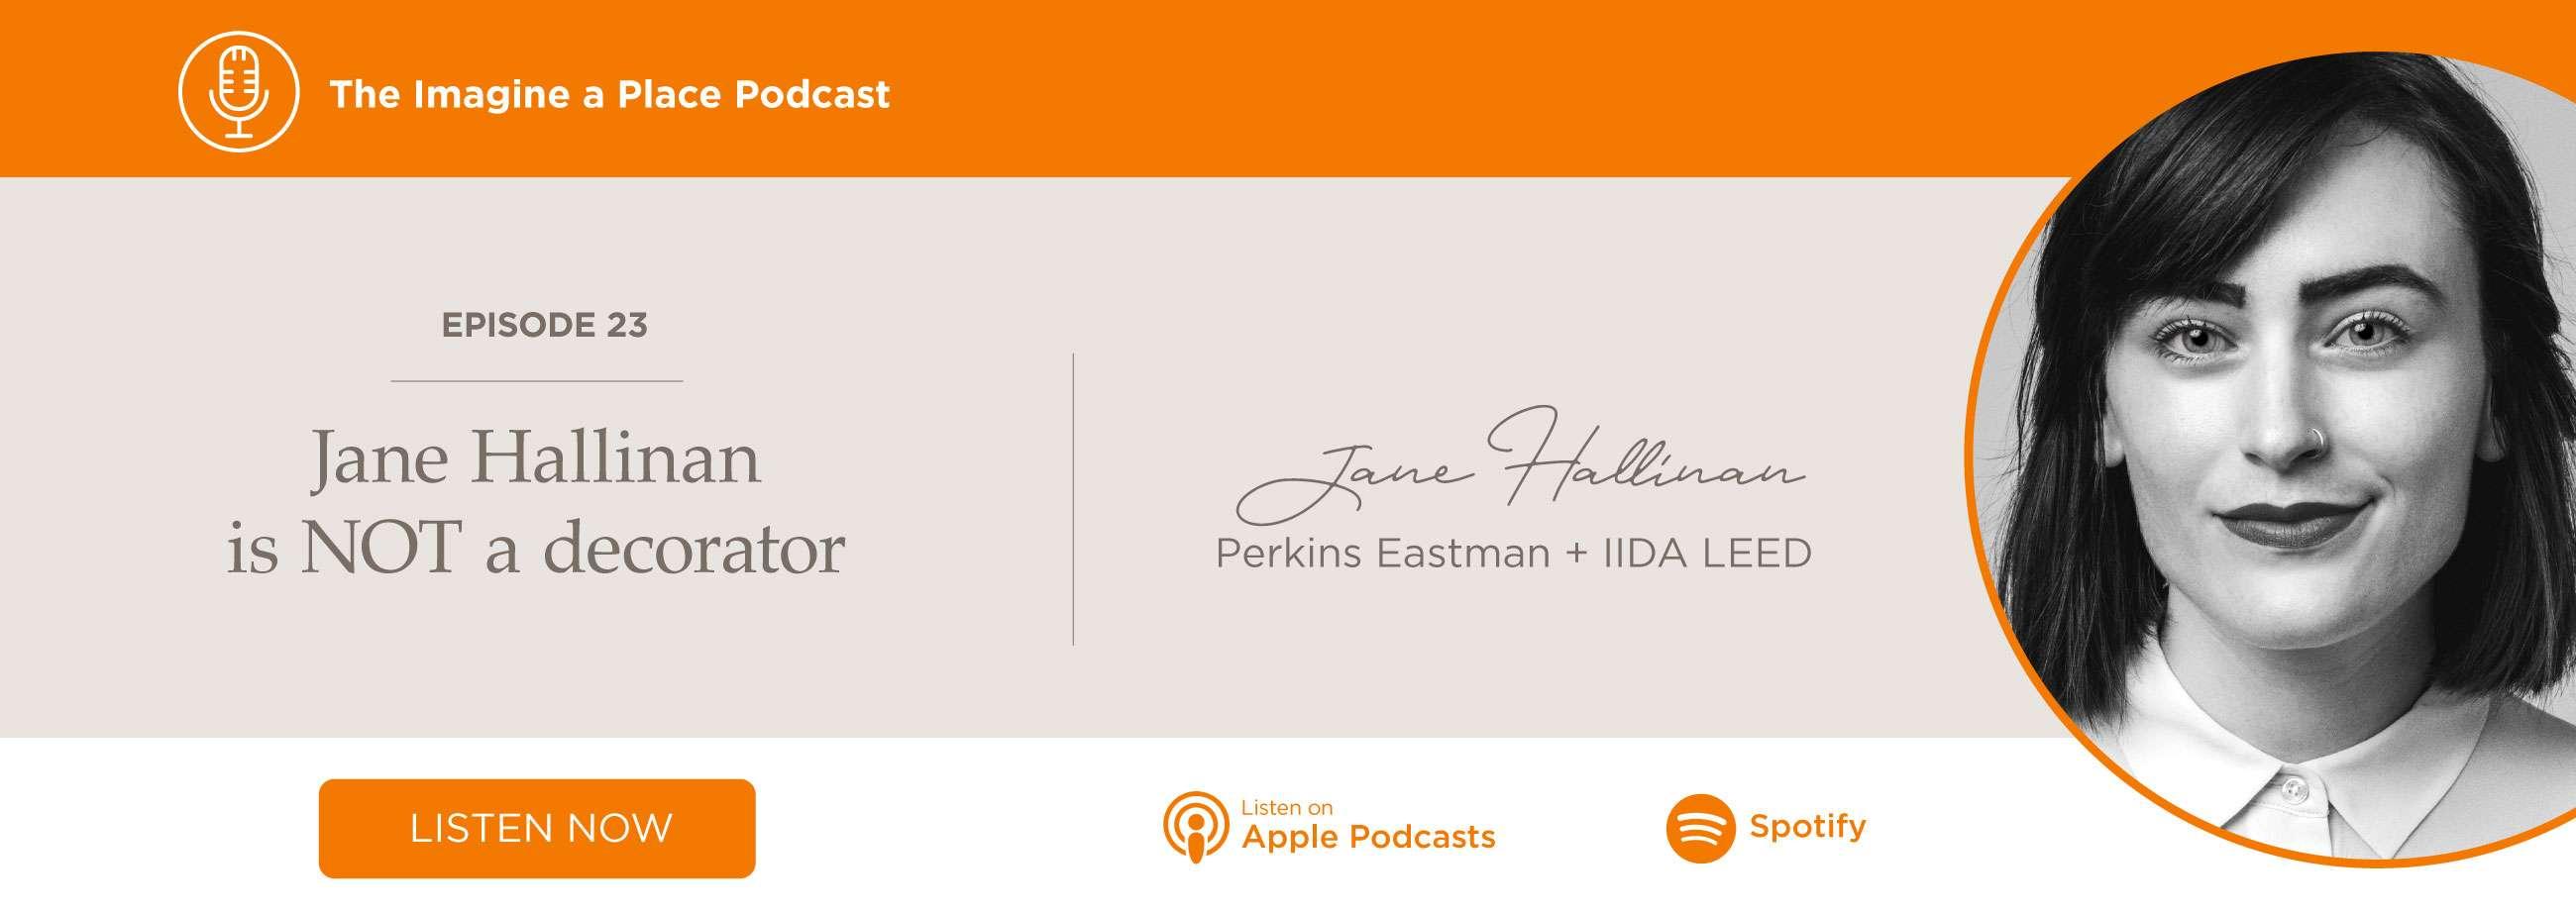 Jane Hallinan is NOT a decorator.